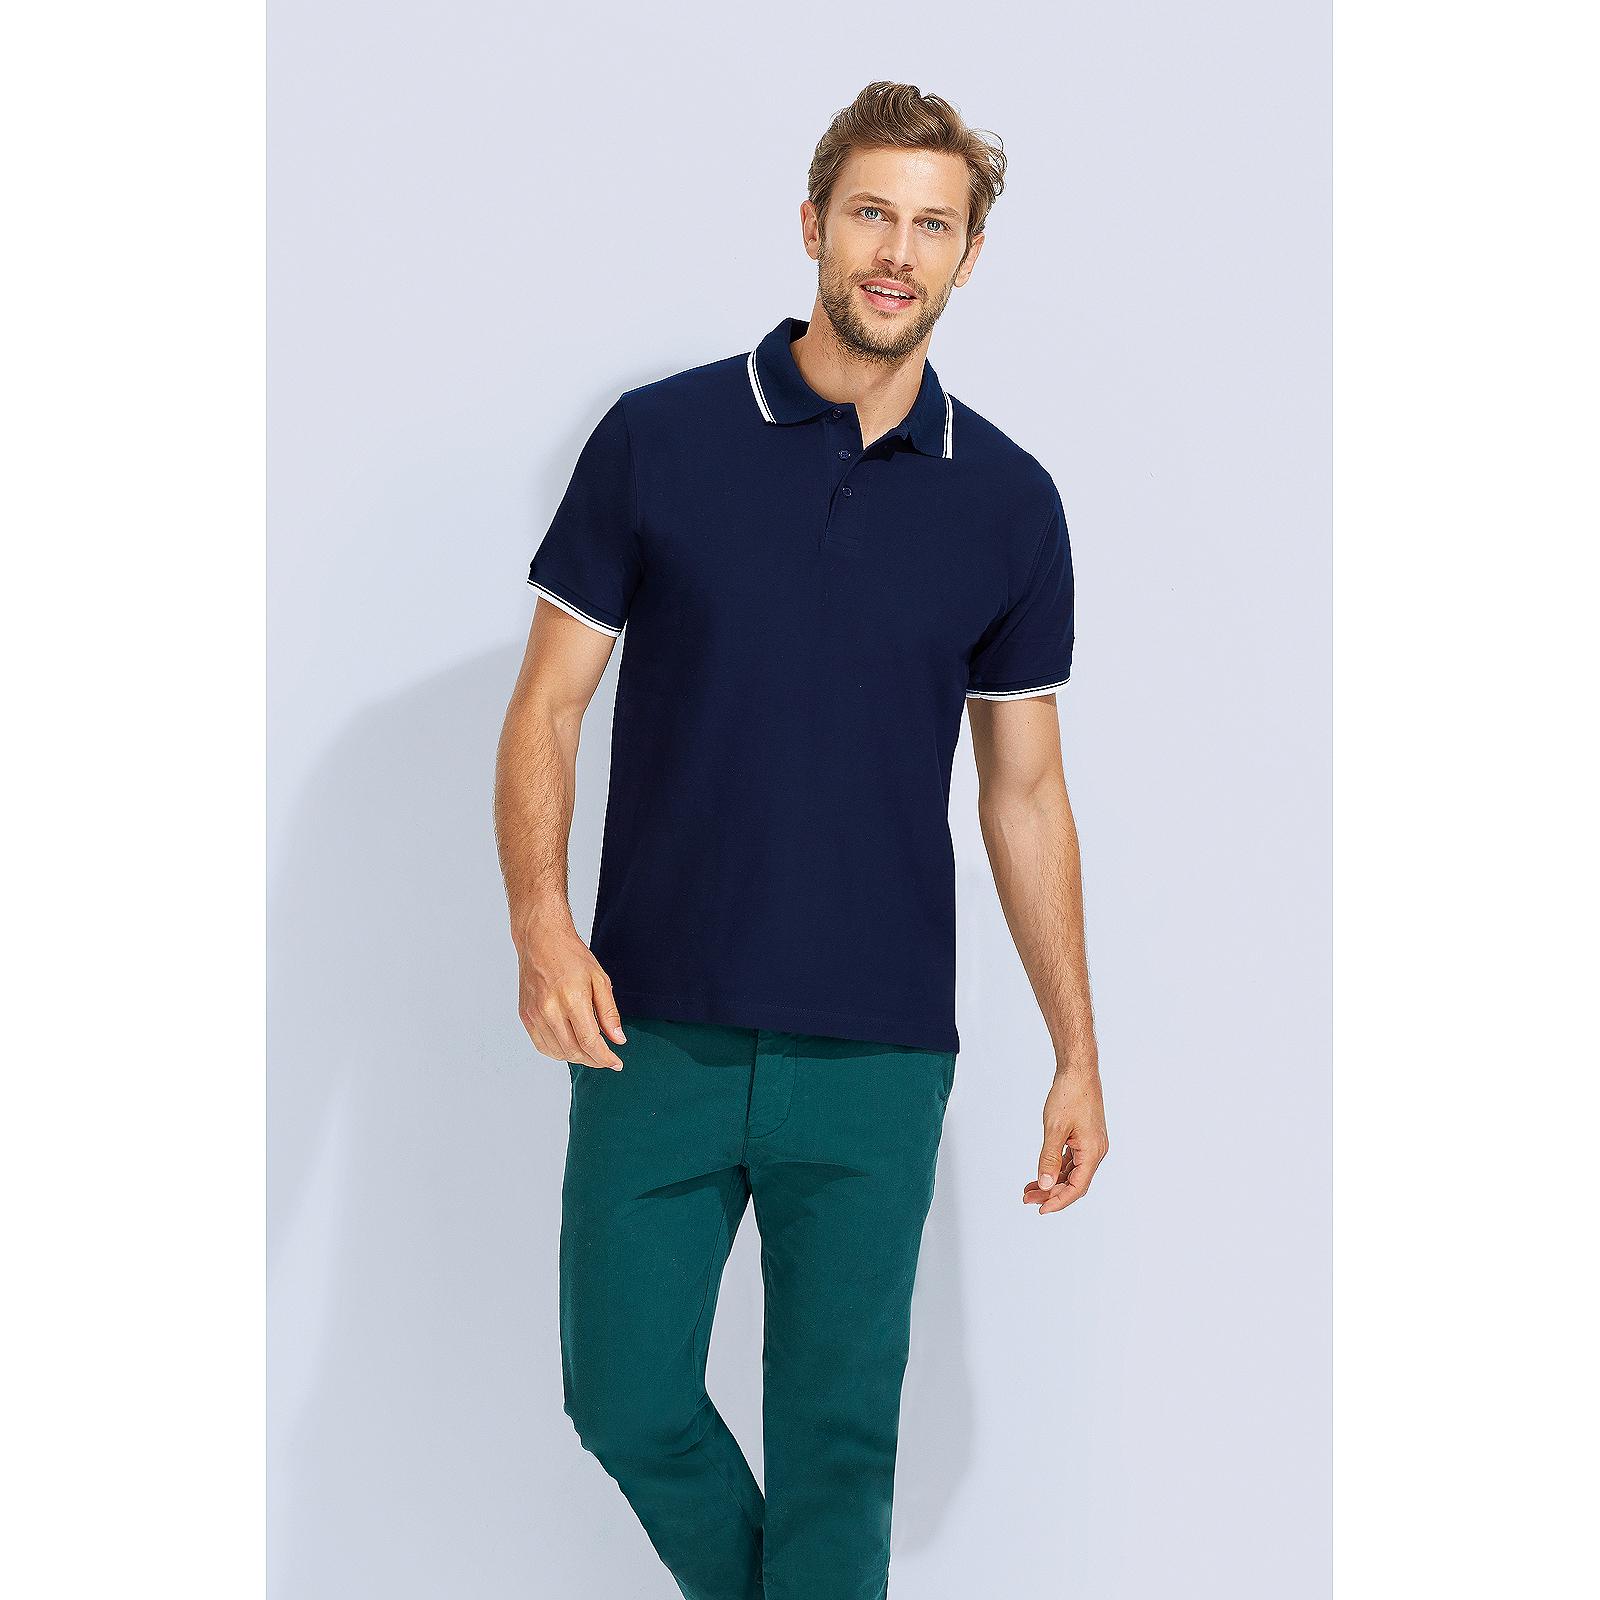 f734e9cb0ff81 Details about Men Practice Tipped Cotton Pique Polo Shirt Short Sleeve  Cotton Smart Casual Top